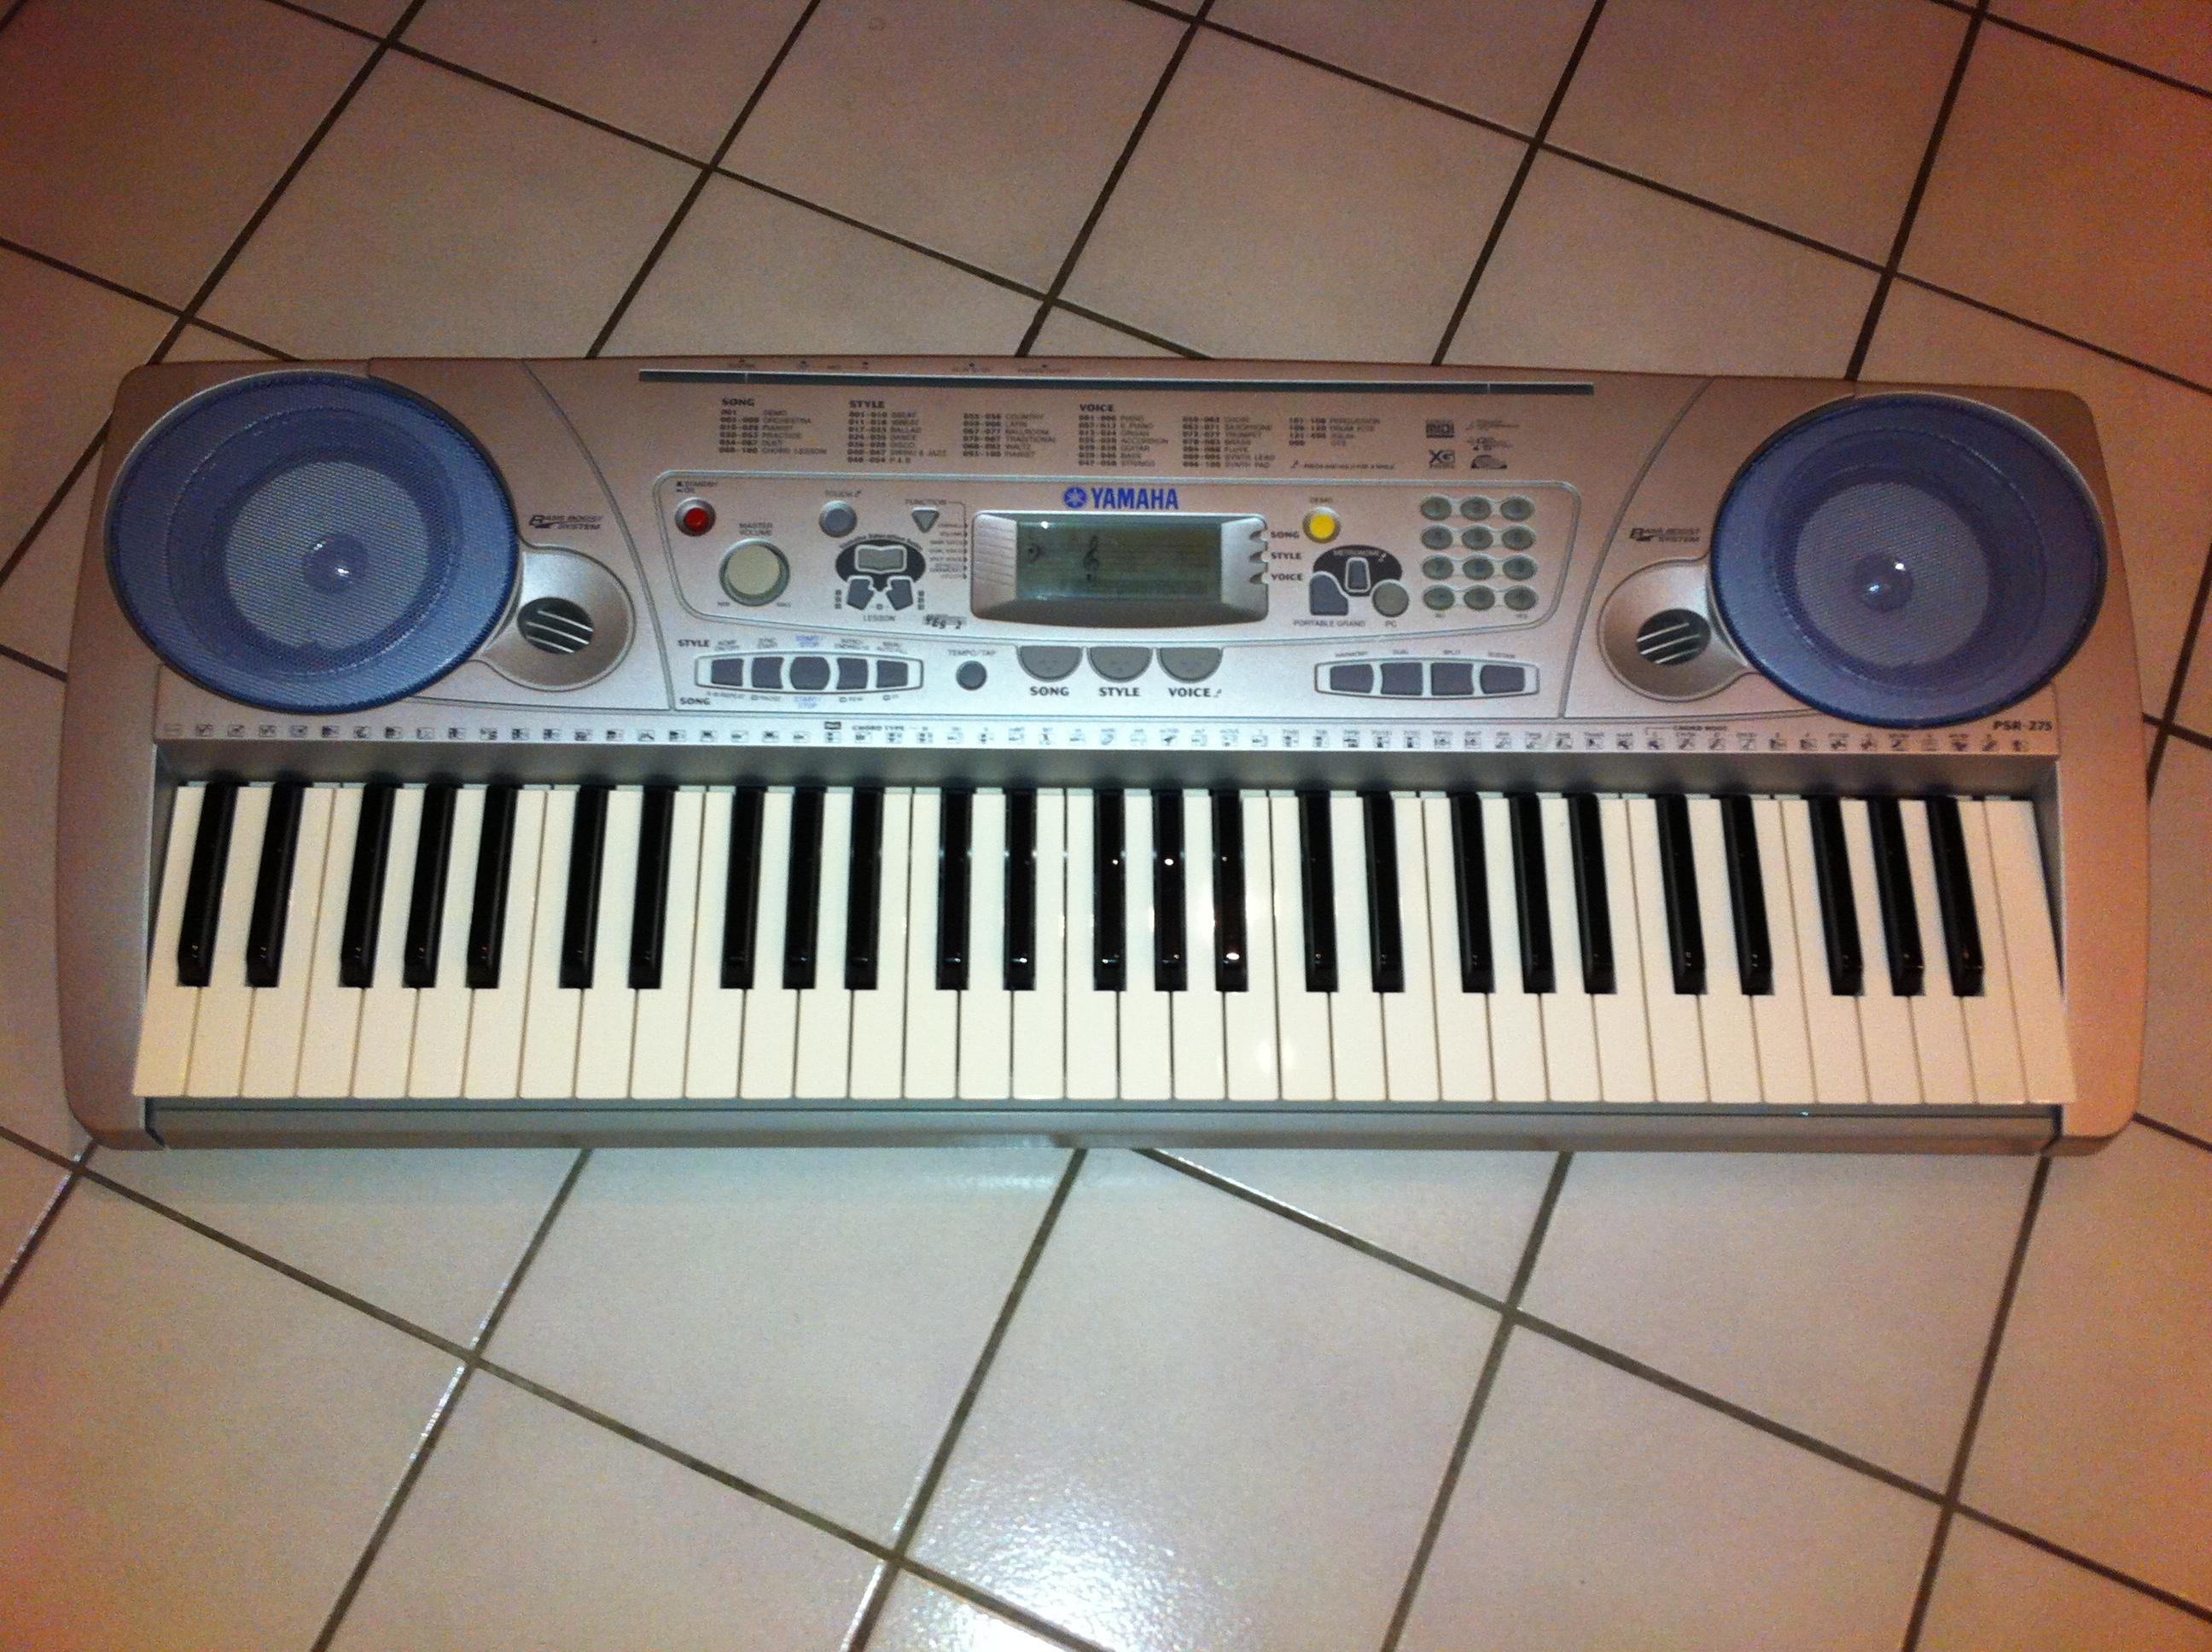 yamaha psr 275 image 874289 audiofanzine rh en audiofanzine com Yamaha Keyboard PSR 282 Notes yamaha keyboard psr 275 user manual